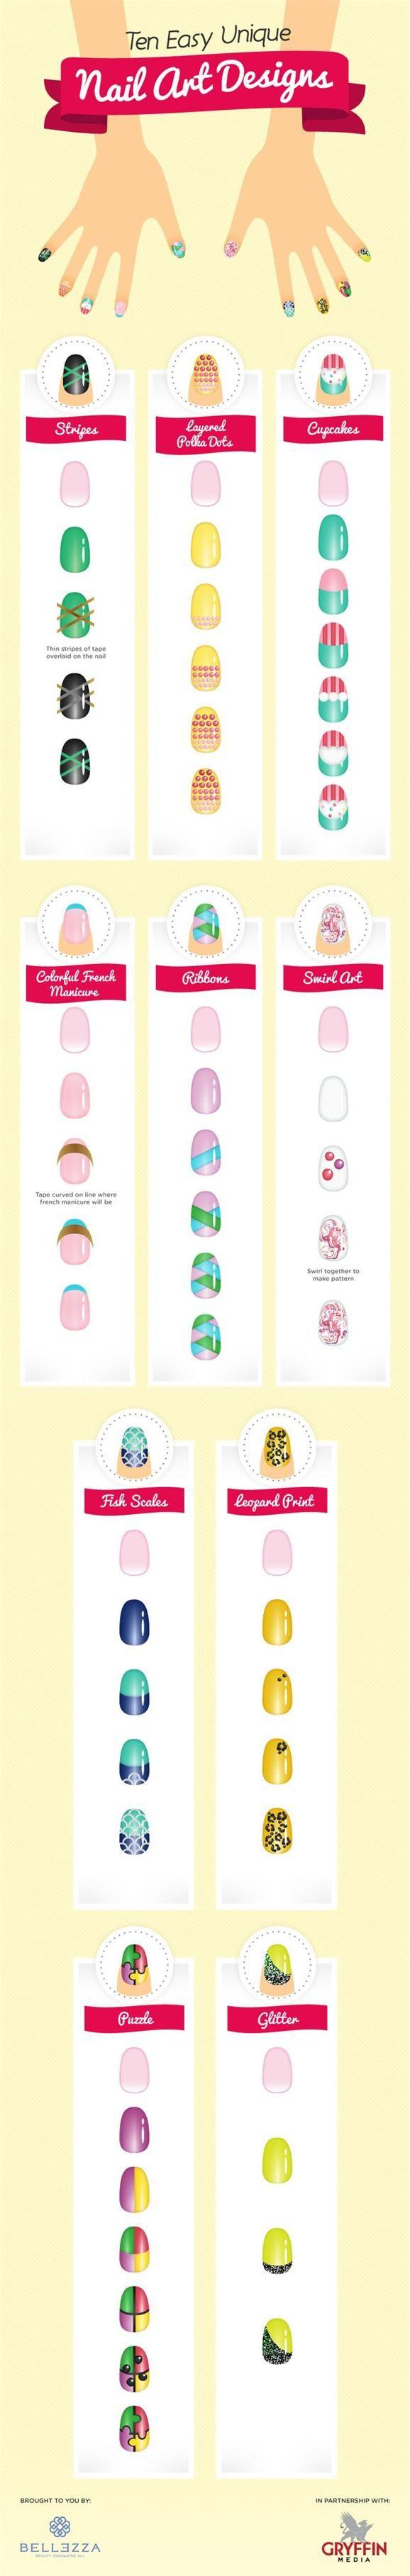 10 Nail Art Designs/Tutorials - #nails #nailpolish #polish #nailart #naildesign #cute #fun #pretty #howto #tutorial #beauty #manicure